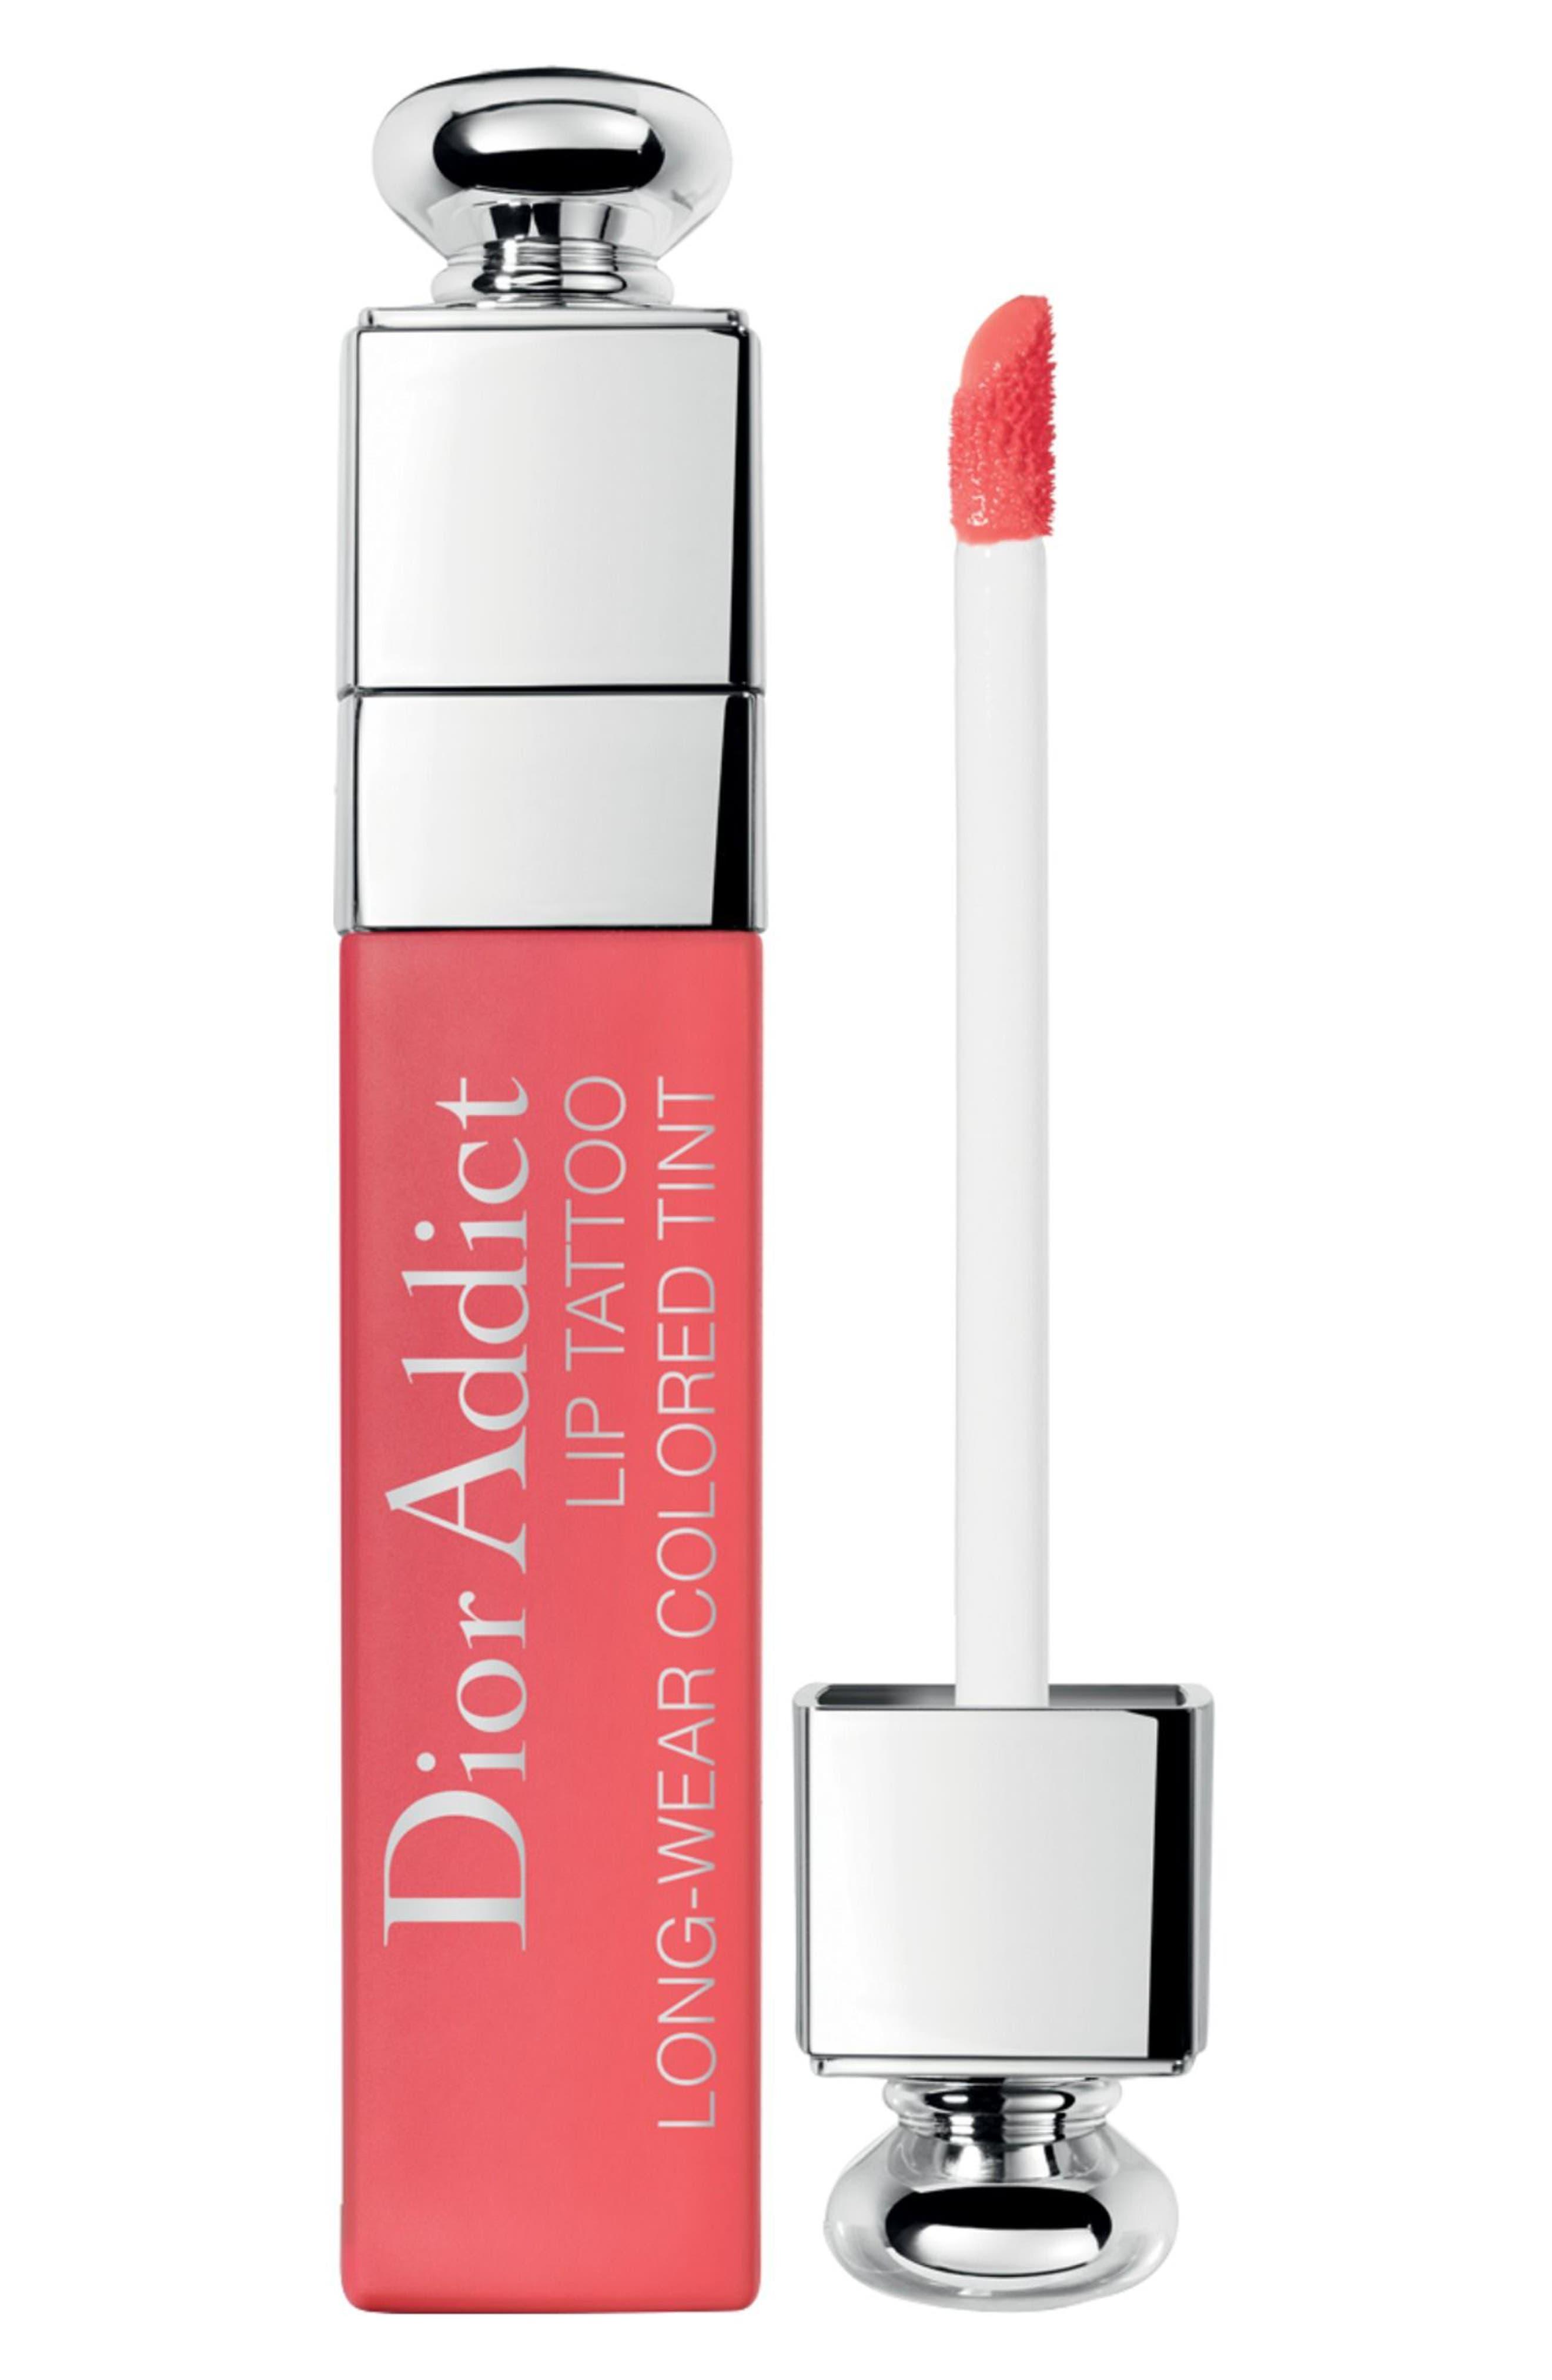 Dior Addict Lip Tattoo Long-Wearing Color Tint - 451 Natural Coral